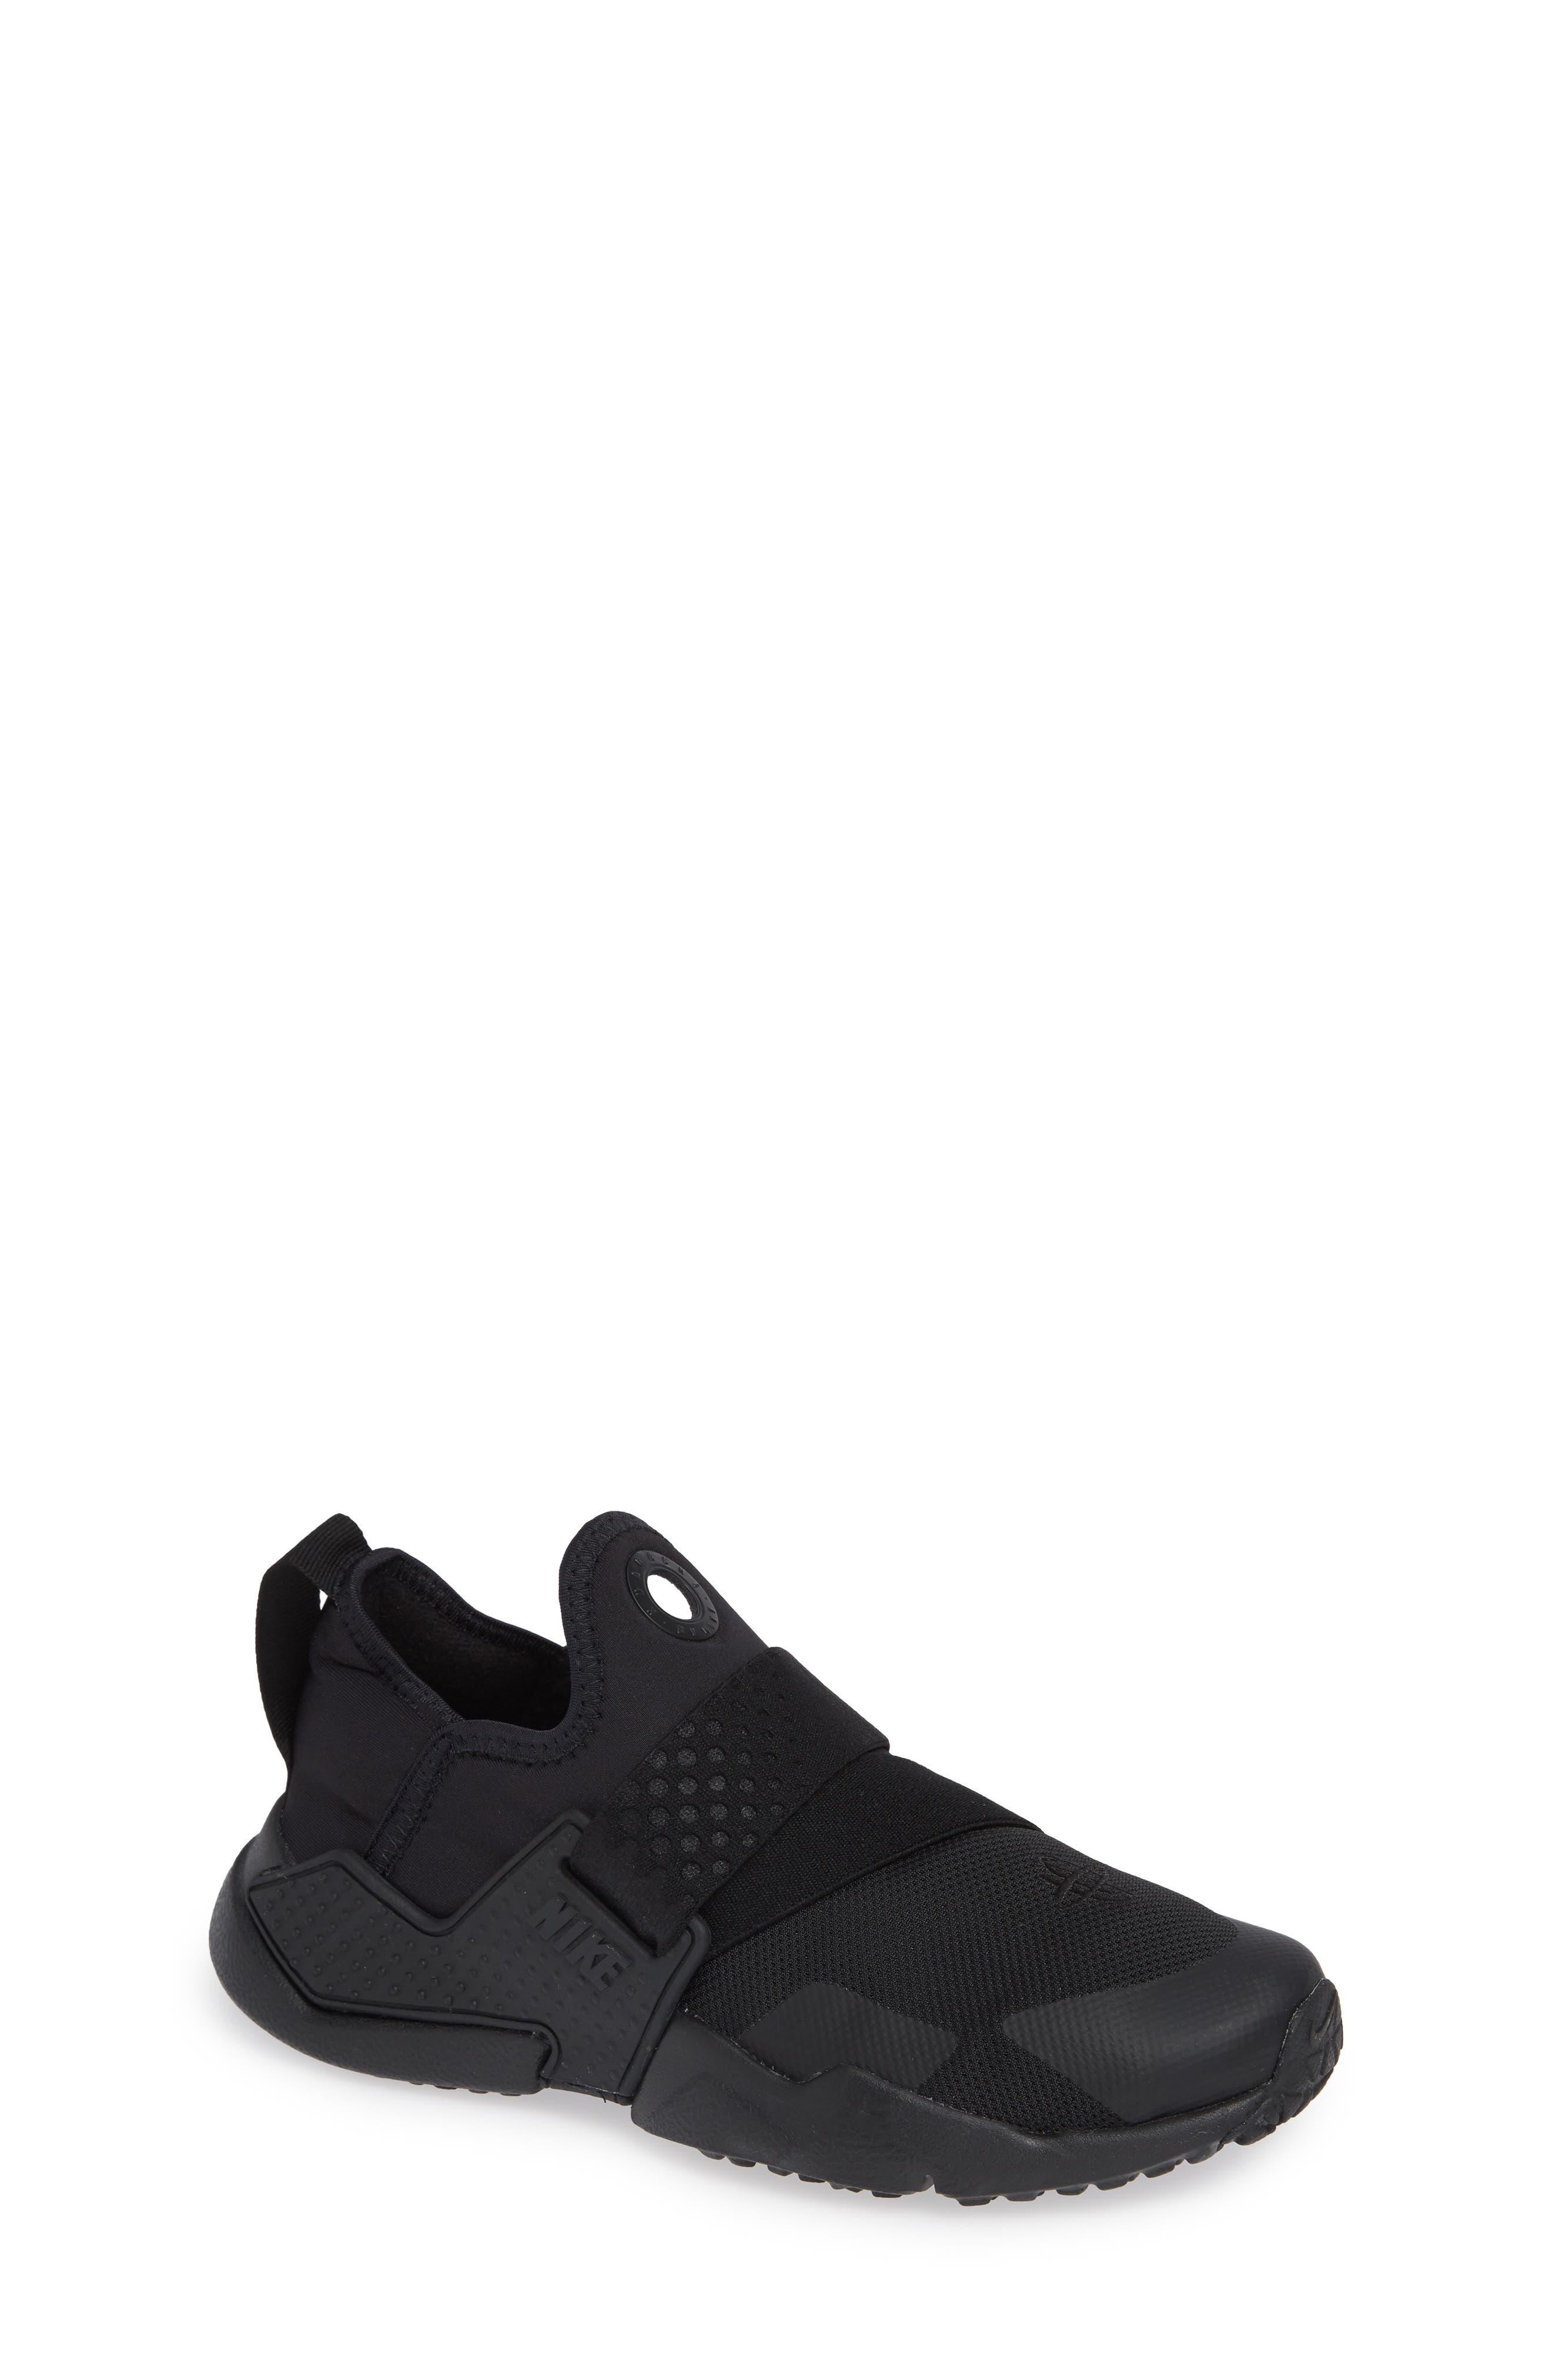 Huarache Extreme Sneaker,                         Main,                         color, BLACK